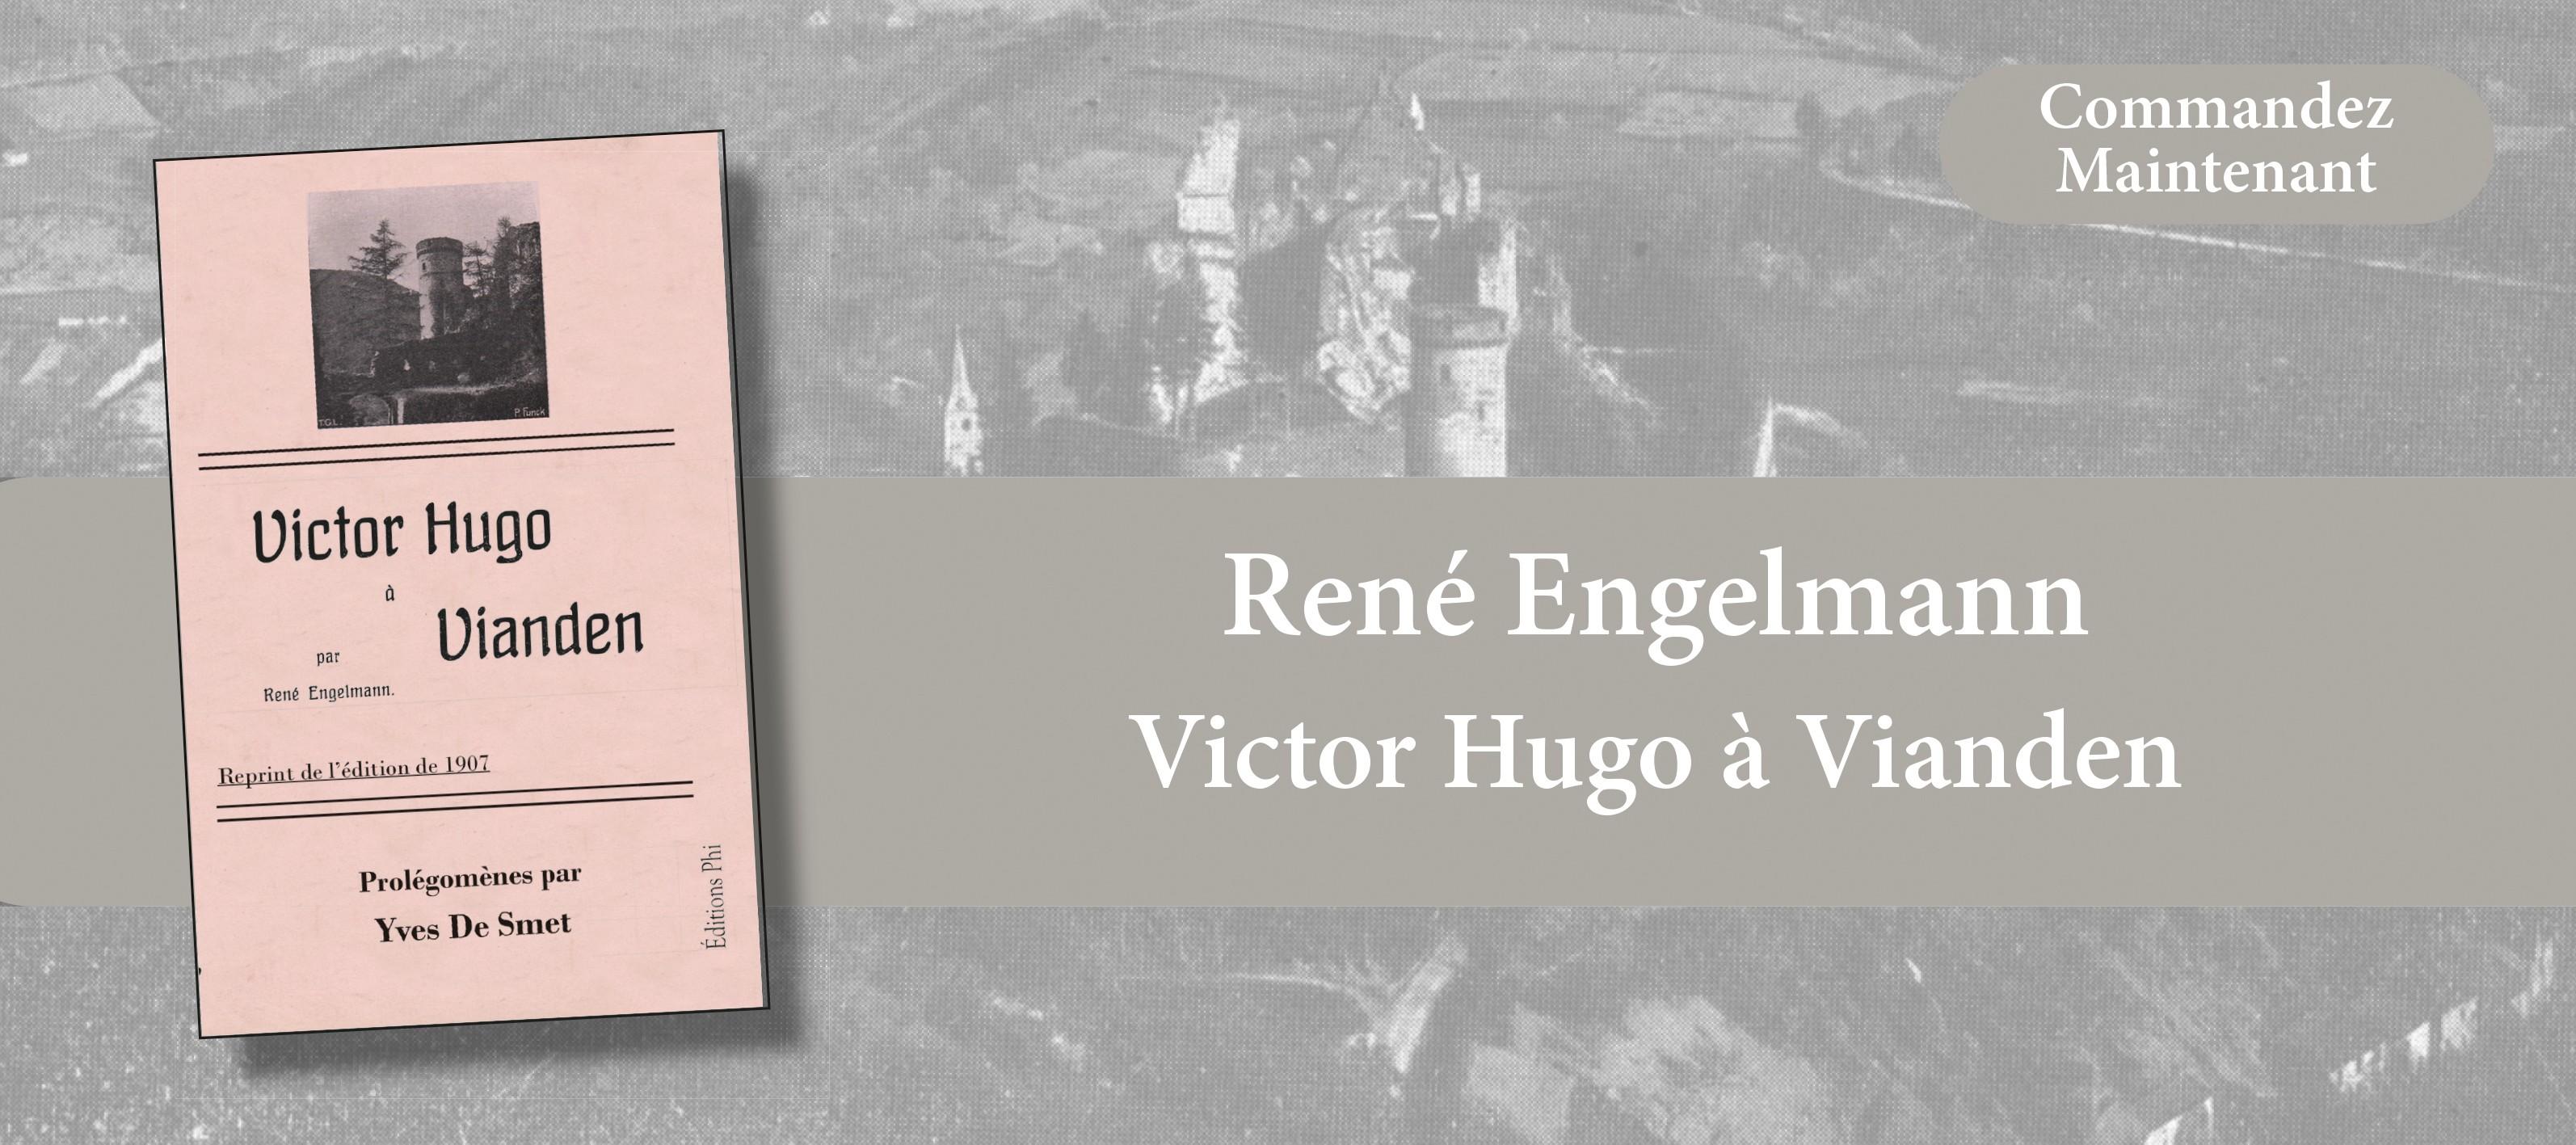 http://www.editionsphi.lu/fr/essai/505-rene-engelmann-victor-hugo-a-vianden.html